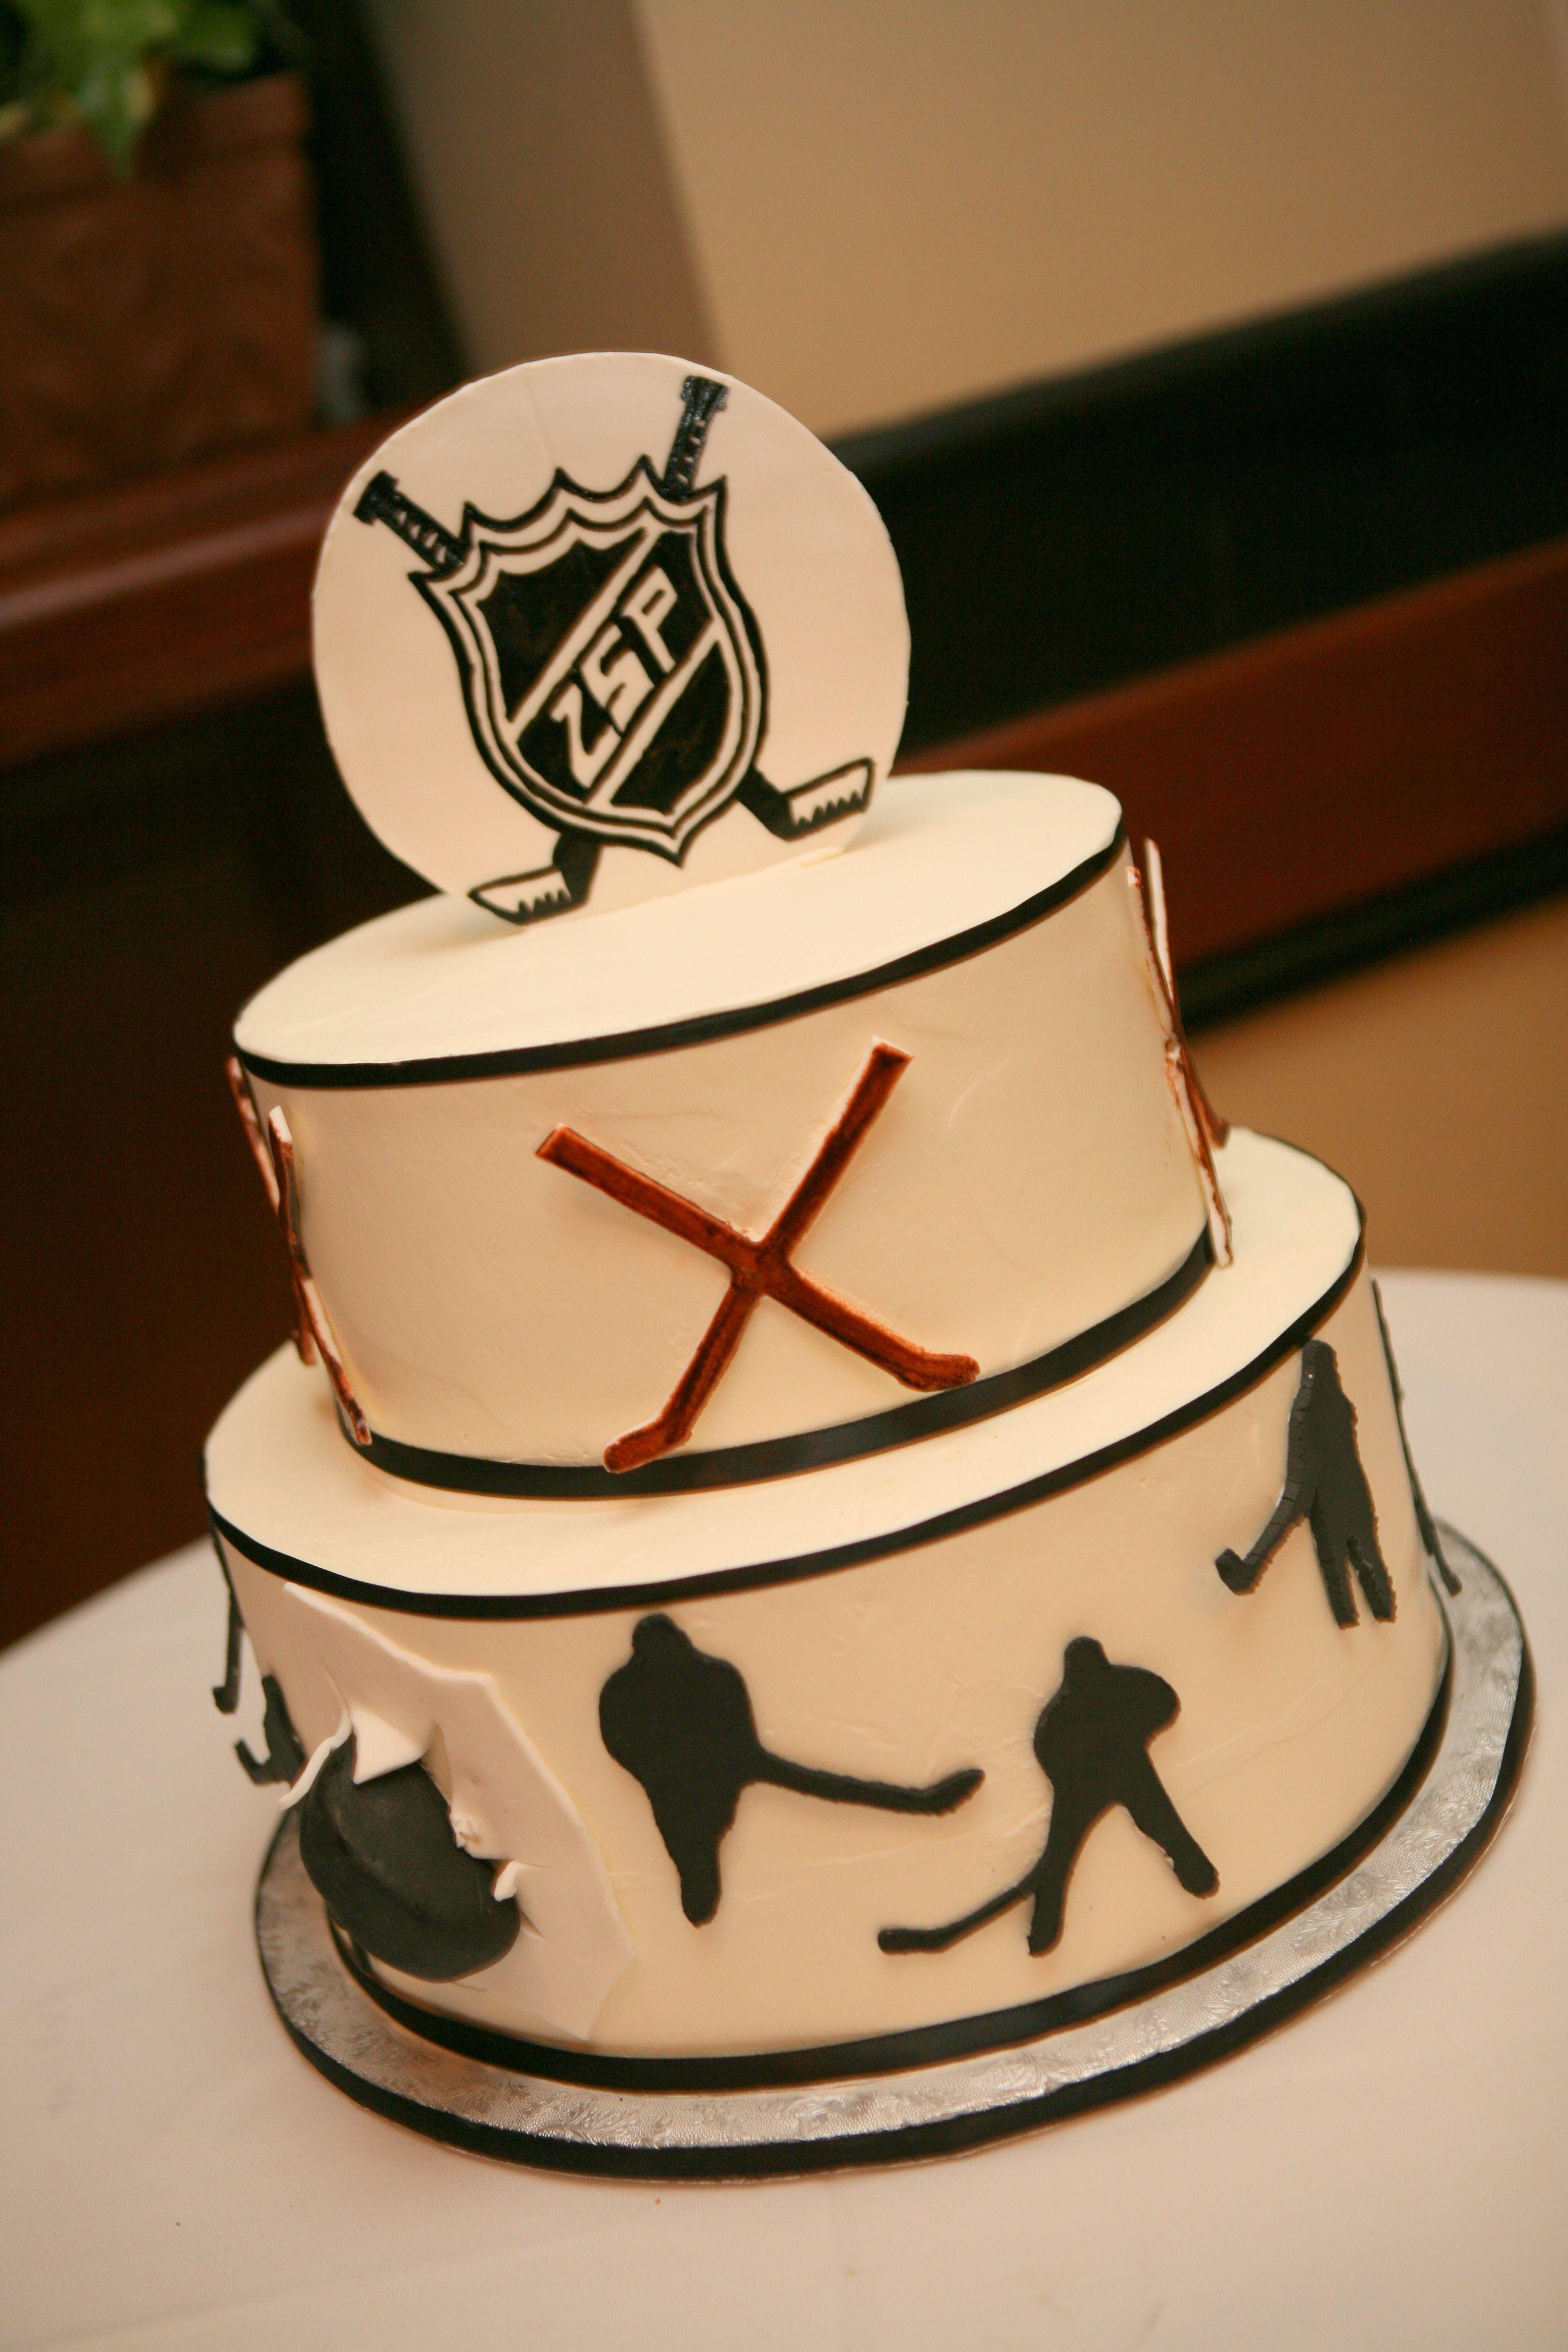 Awe Inspiring Hockey Cake Hockey Birthday Cake Hockey Cakes Boy Birthday Cake Funny Birthday Cards Online Benoljebrpdamsfinfo